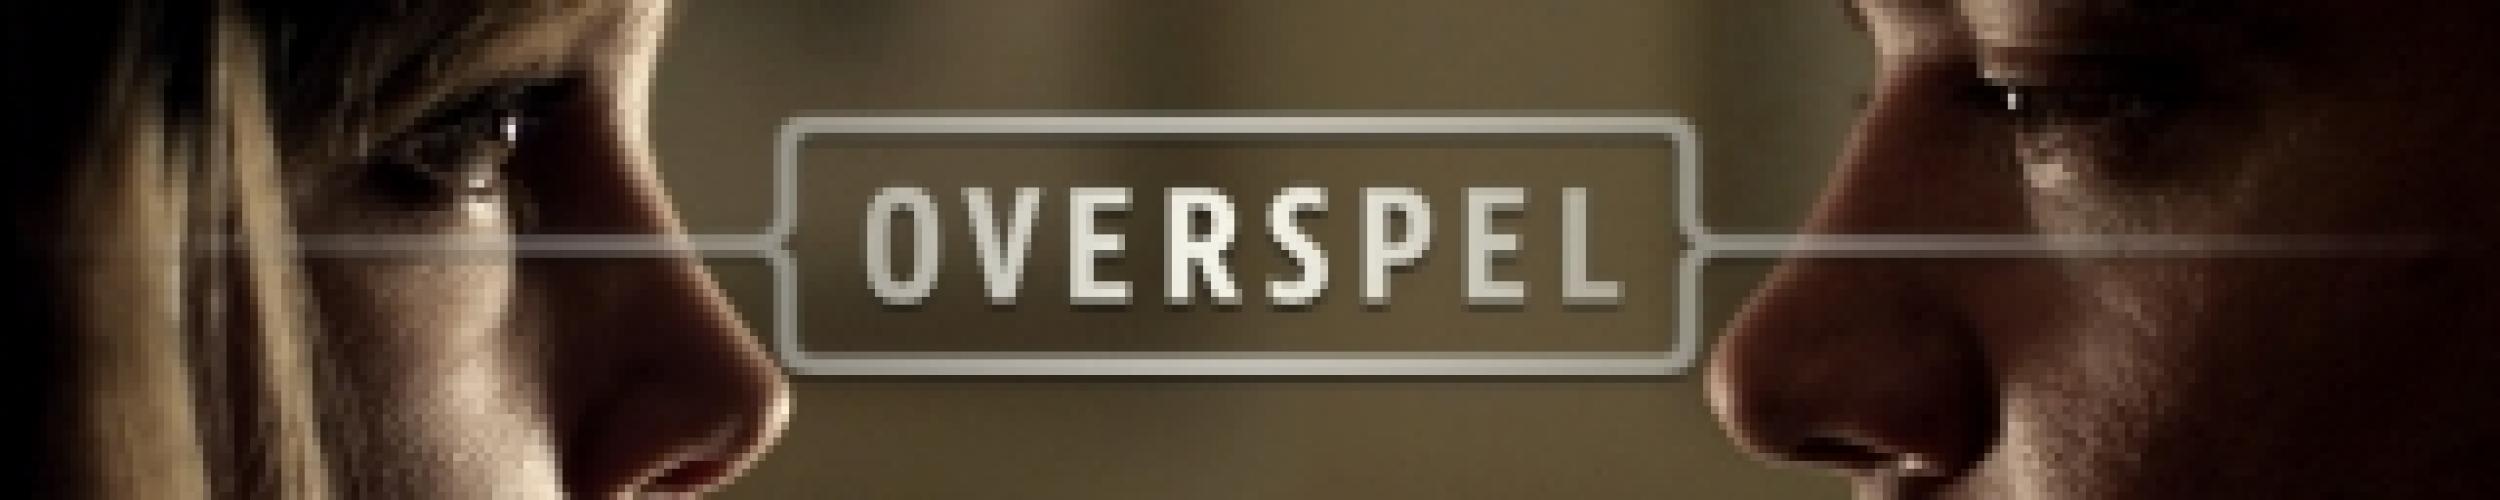 Overspel next episode air date poster